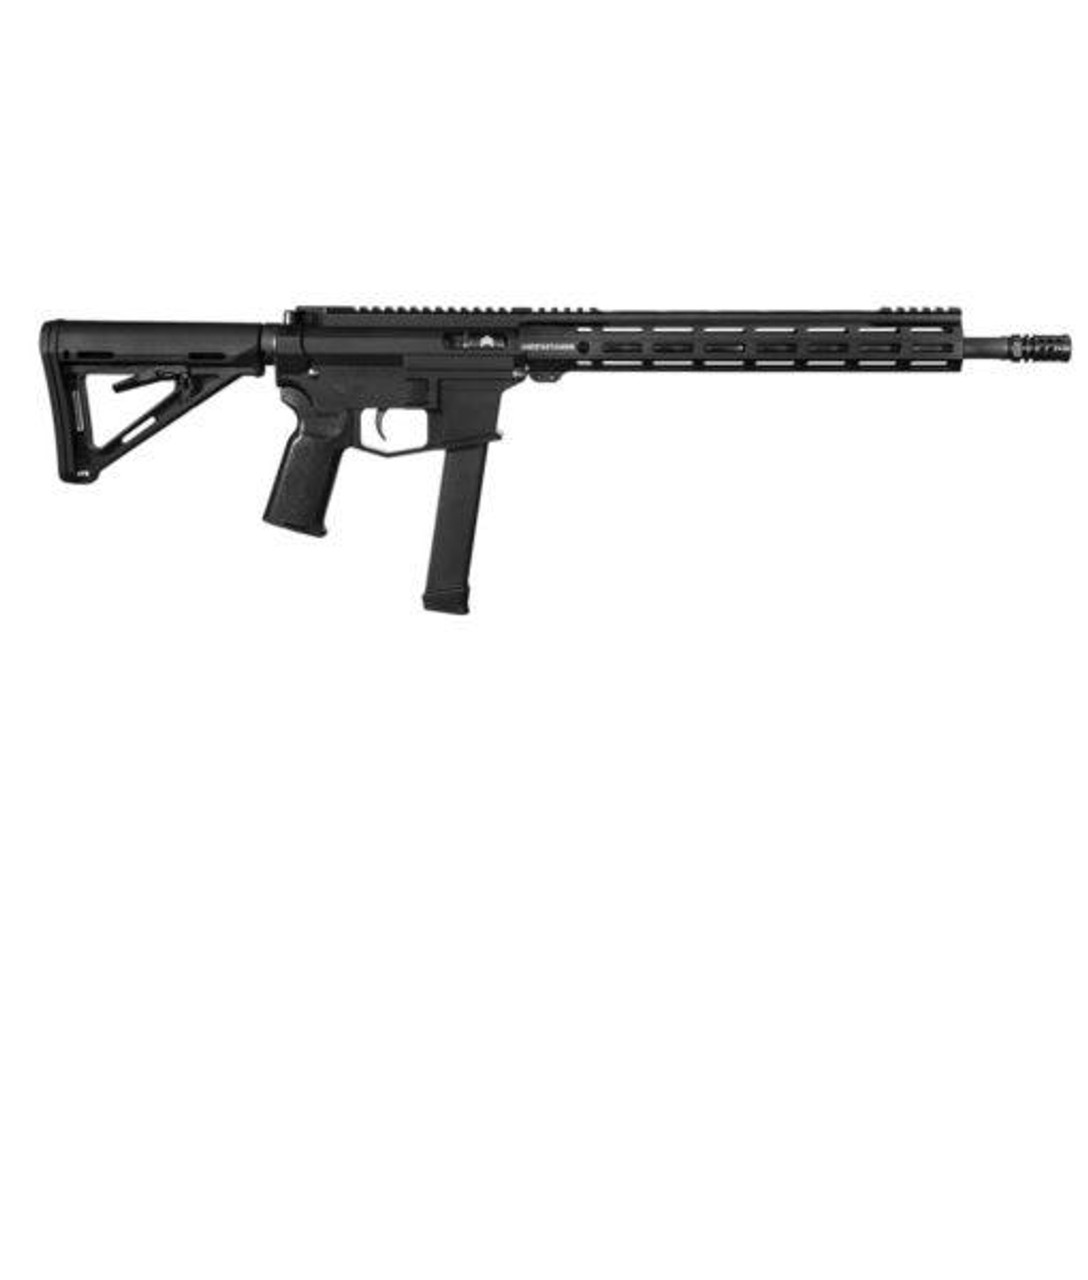 "Angstadt Arms UDP-9 Rifle 9x19mm 16"" M-LOK Magpul Stock Black"